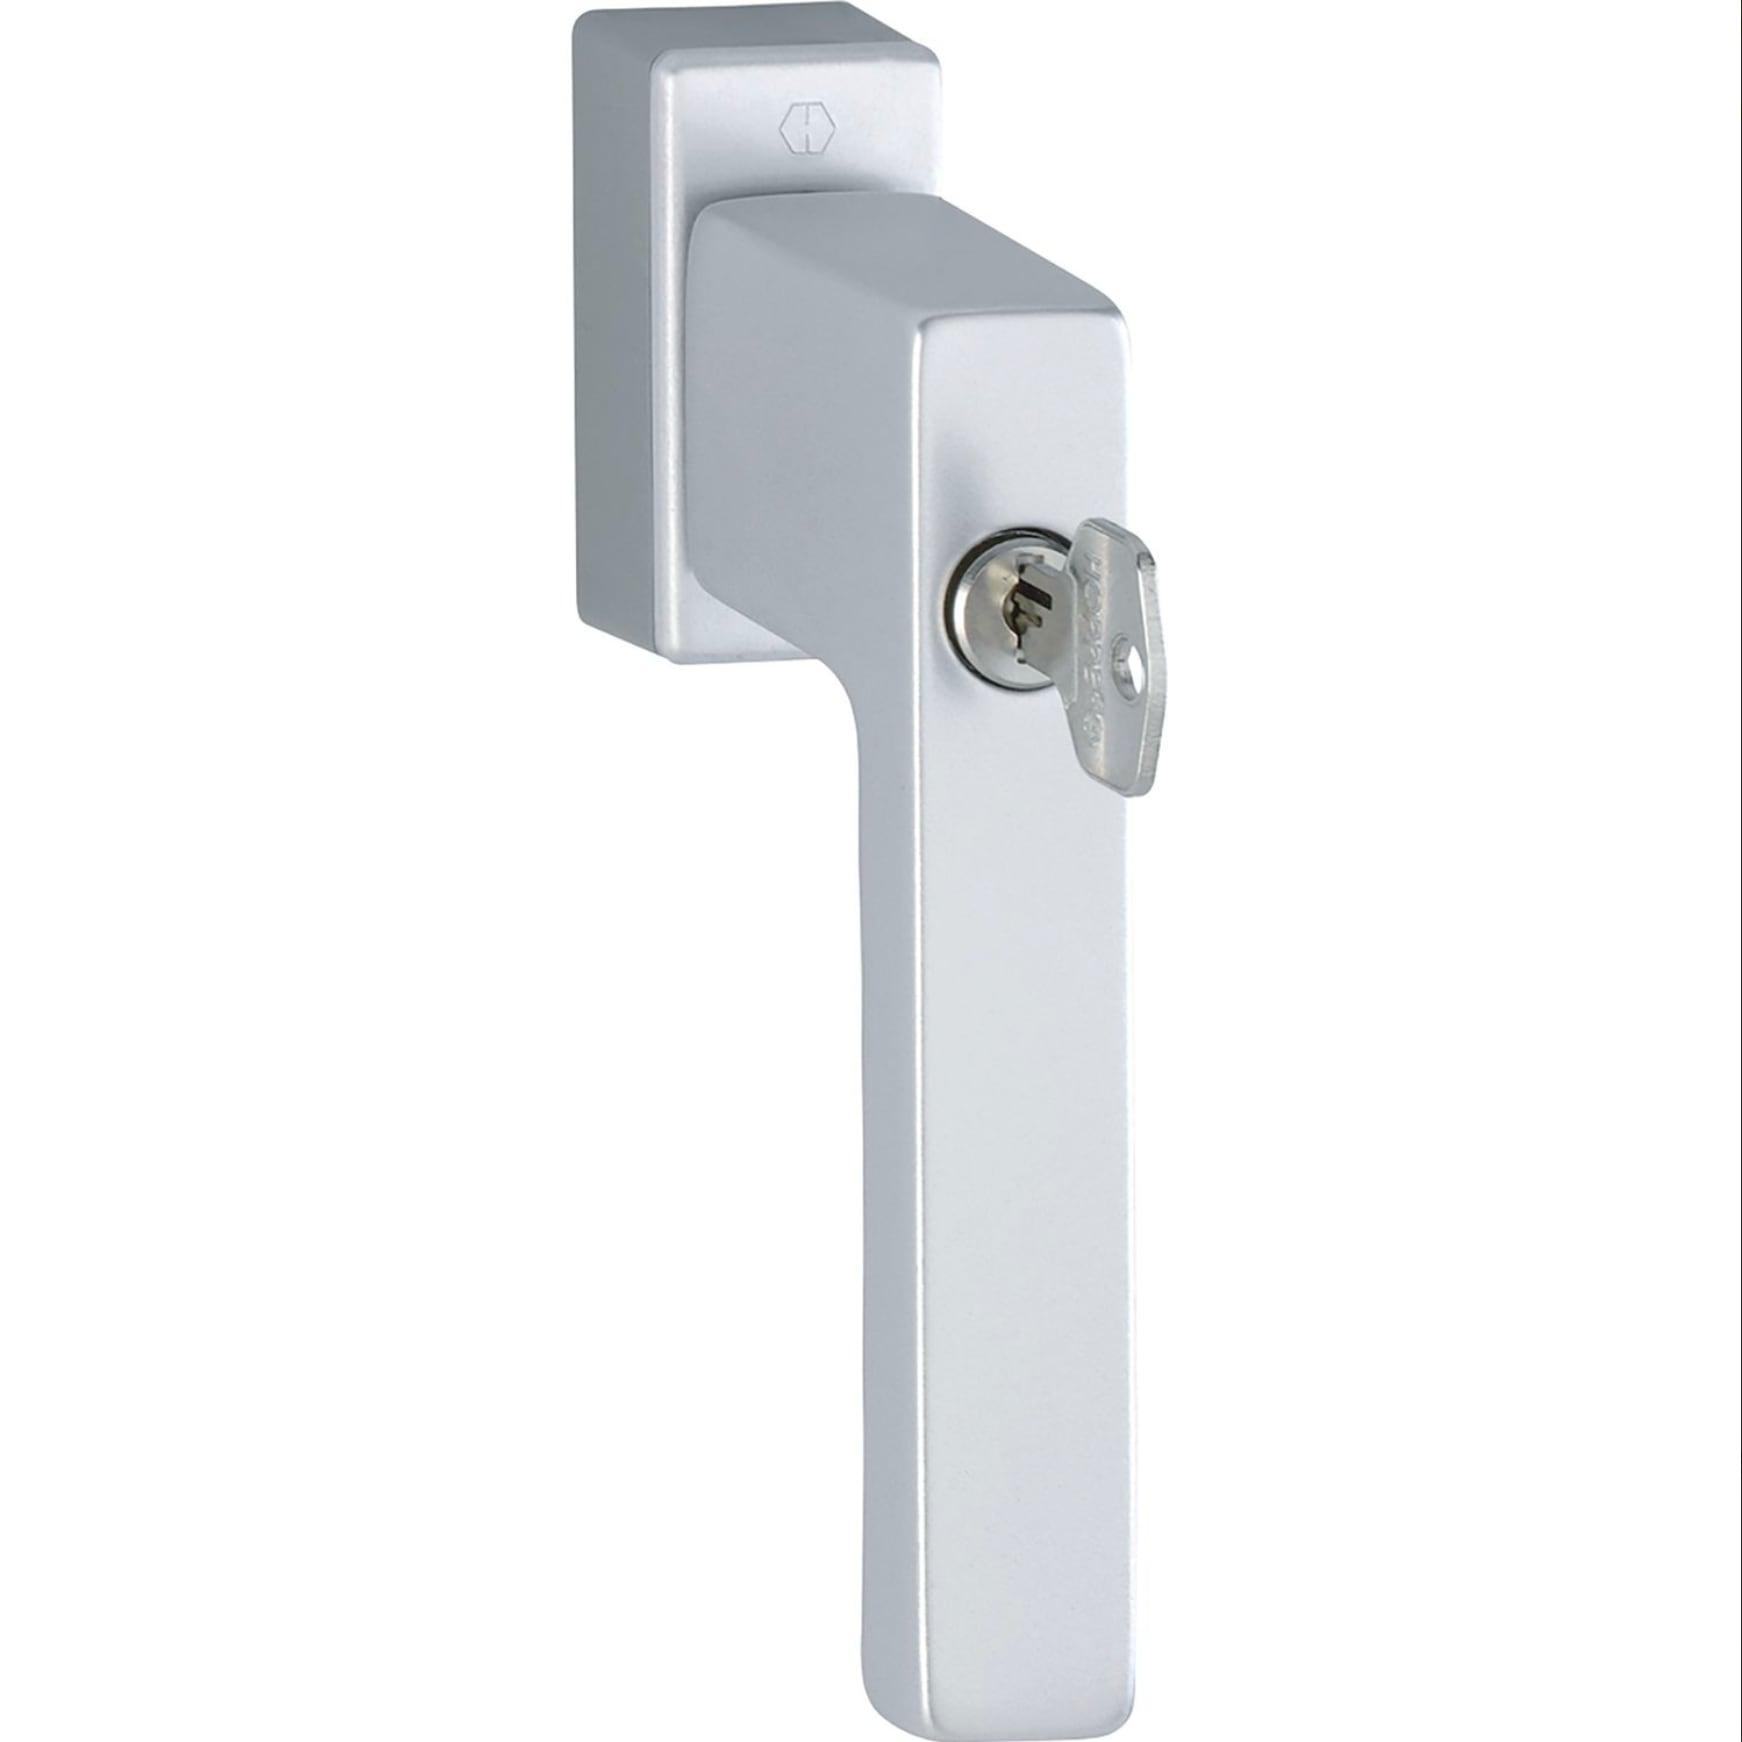 Fenstergriff-HOPPE-TOULON-sperrzylinder-silber-eloxiert